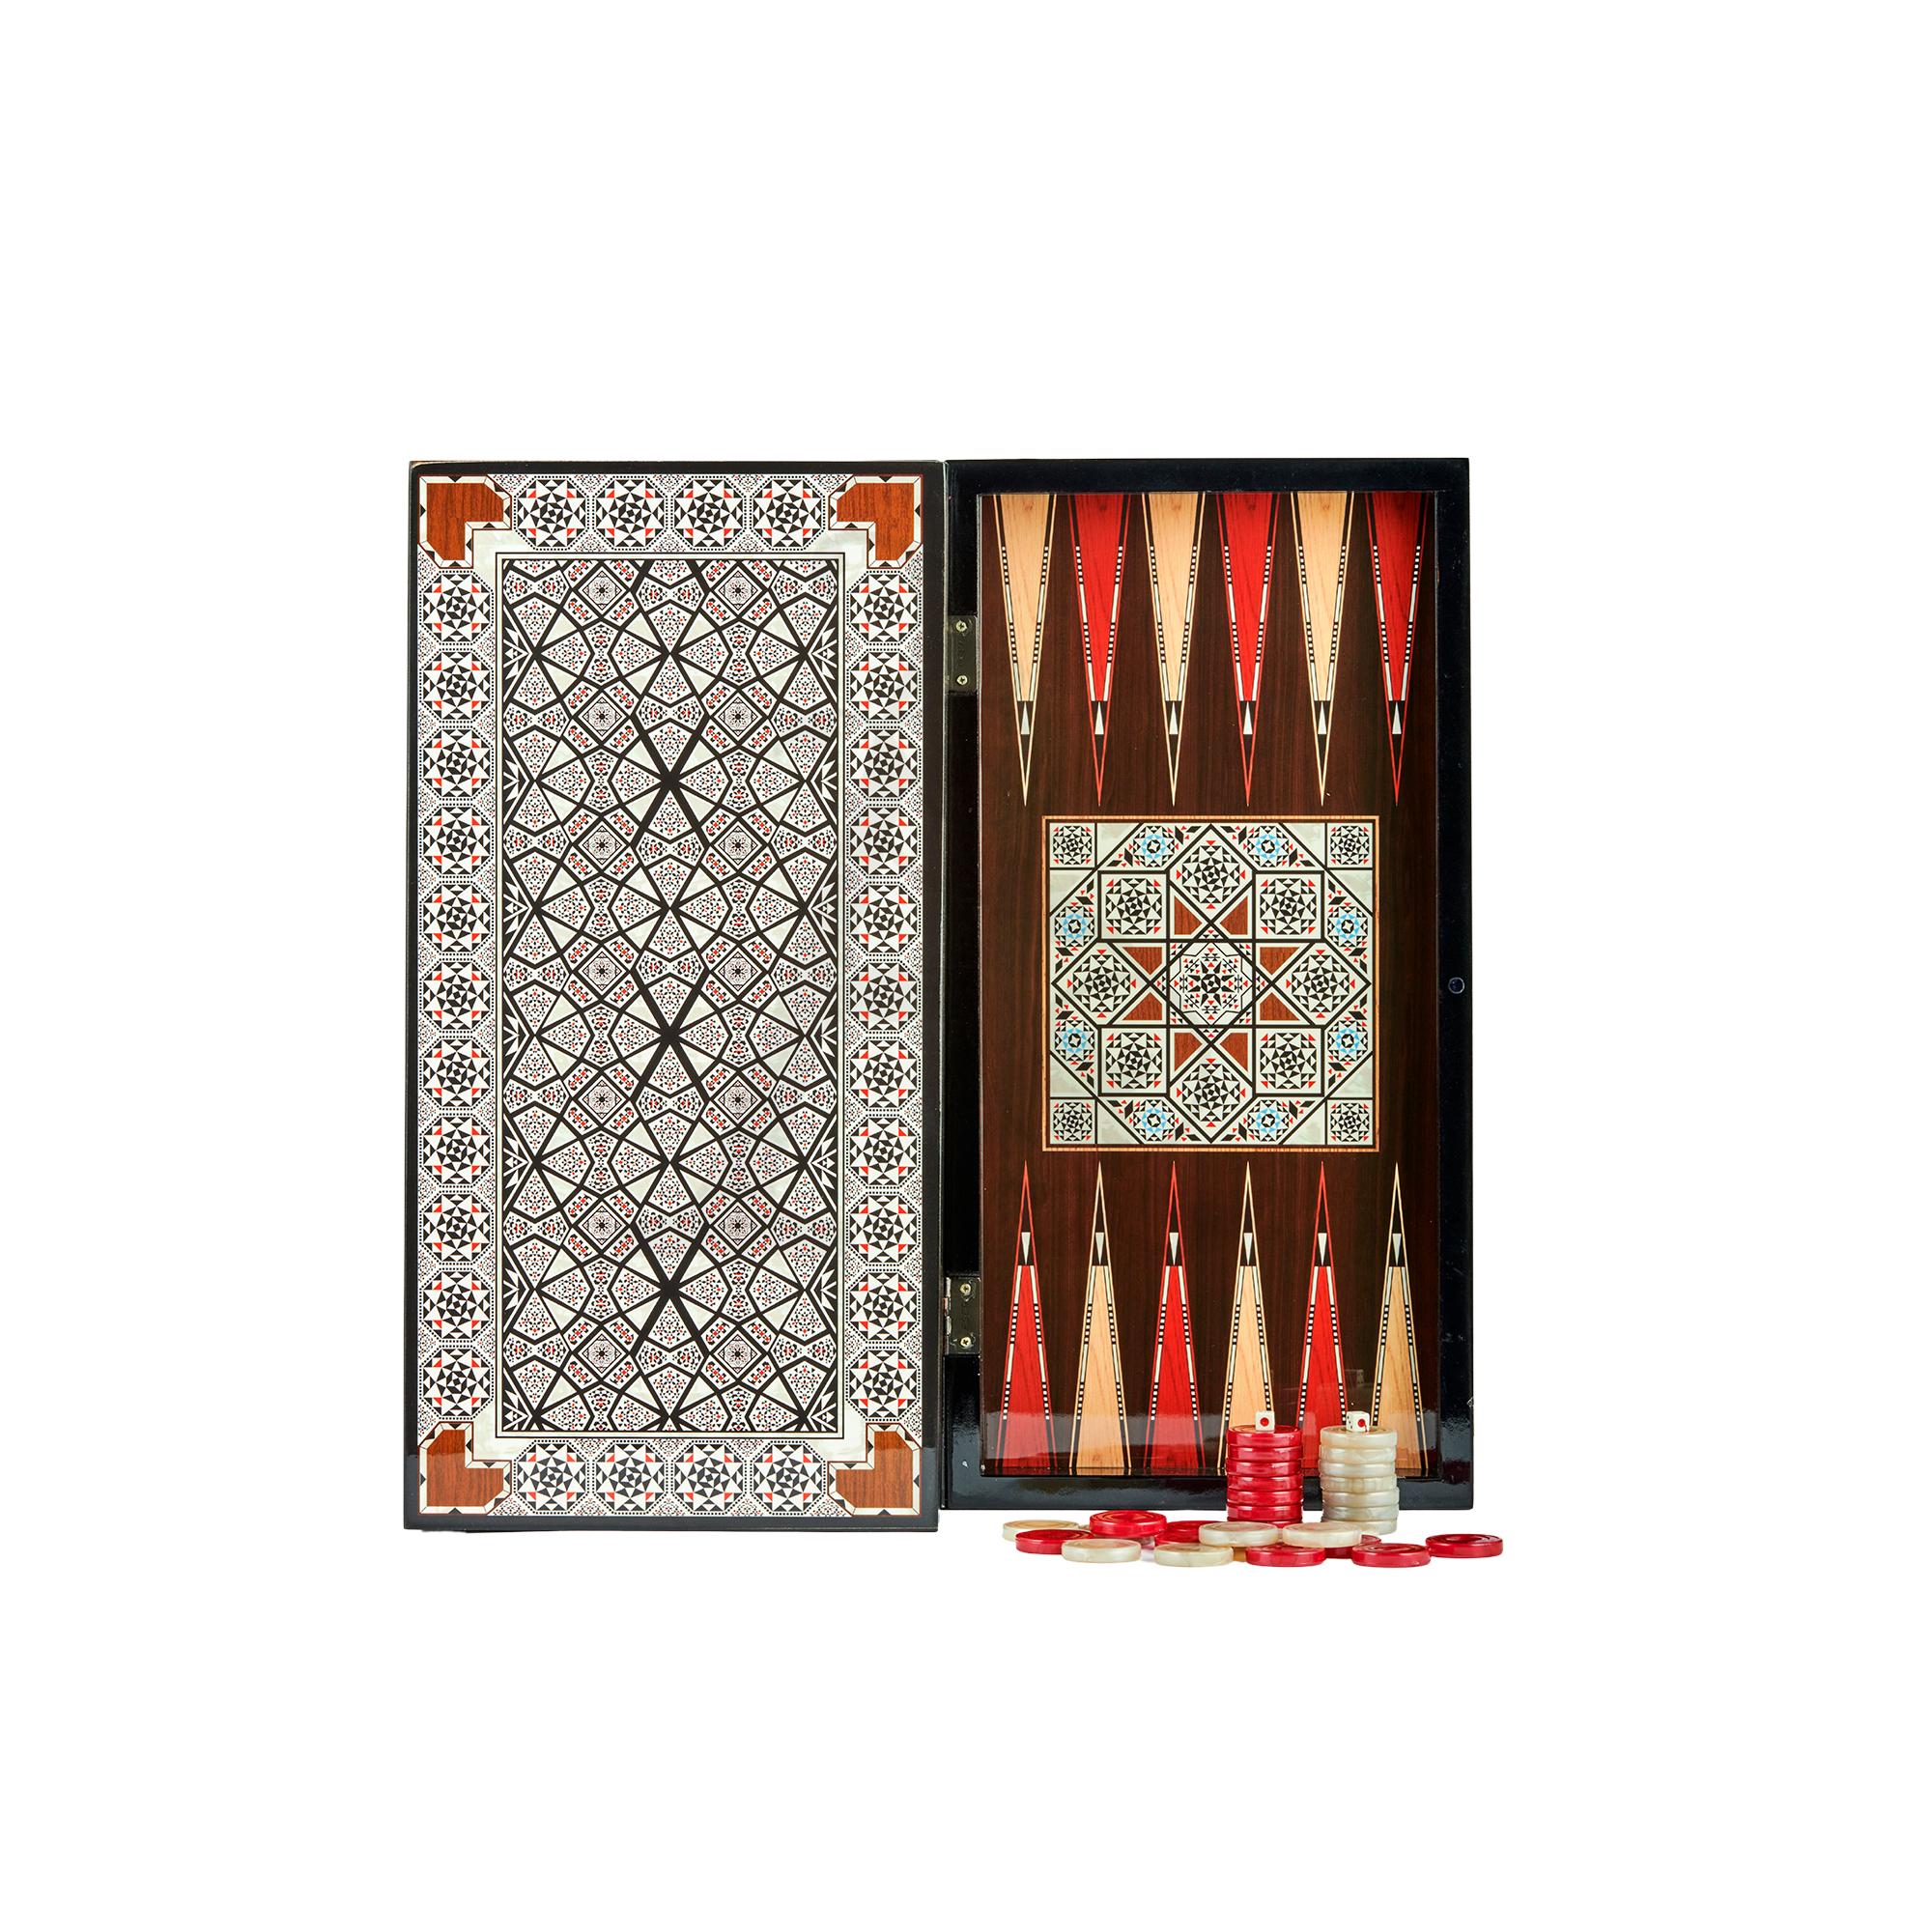 Buy Eser Elegance Backgammon Star Pearl Set